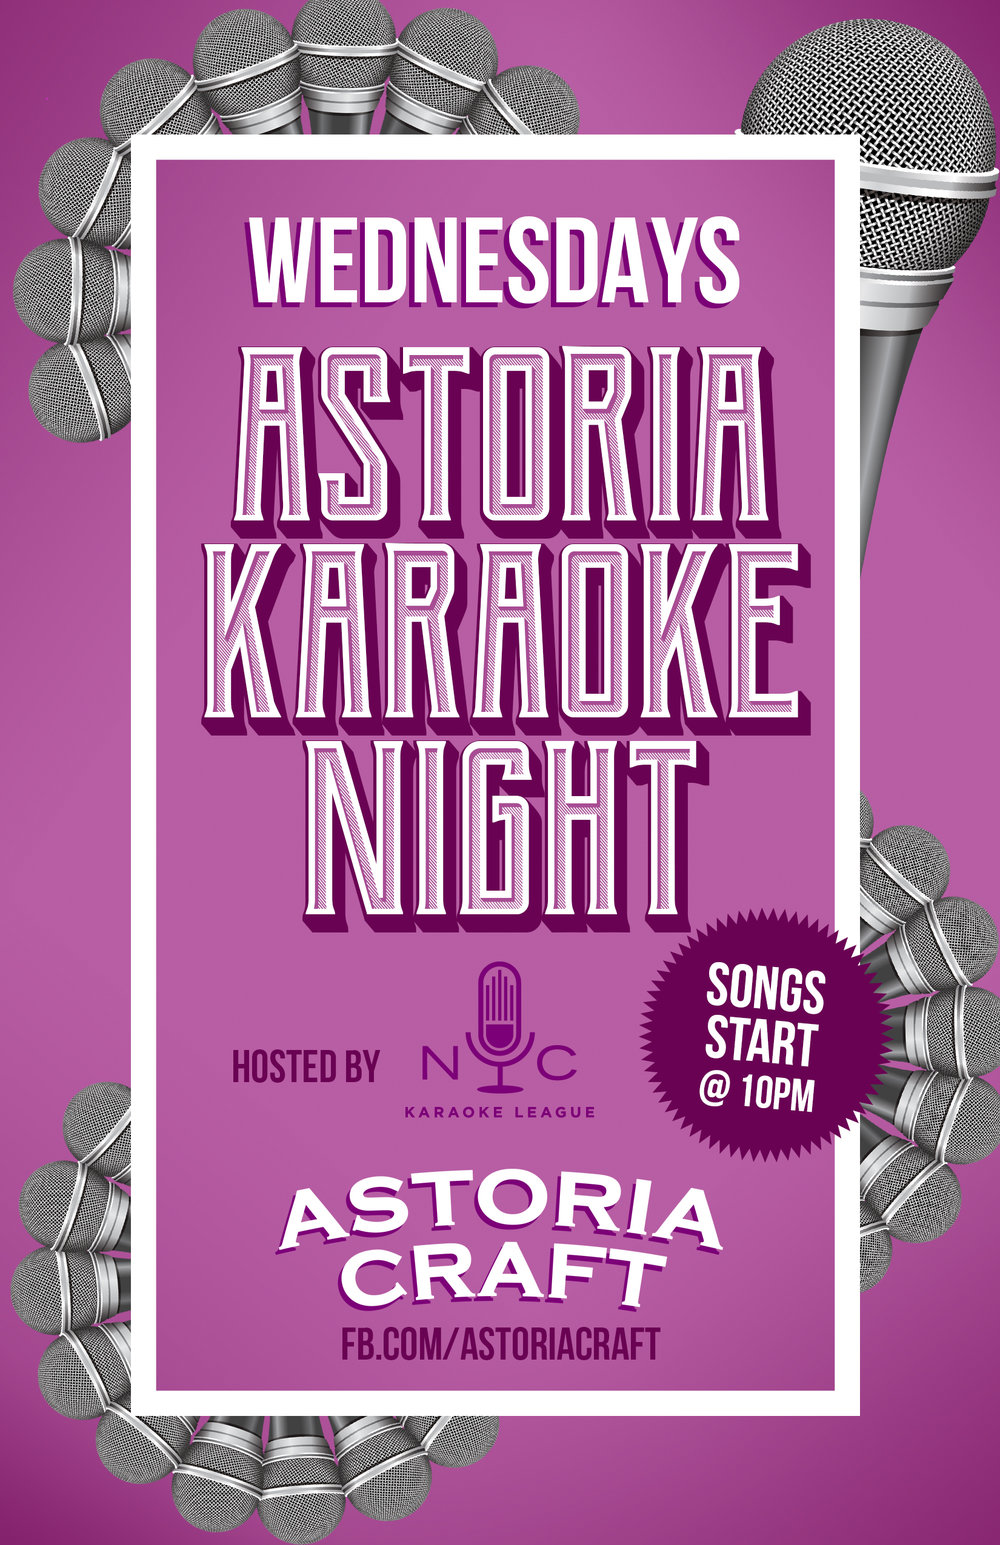 Sing Karaoke near Astoria Park